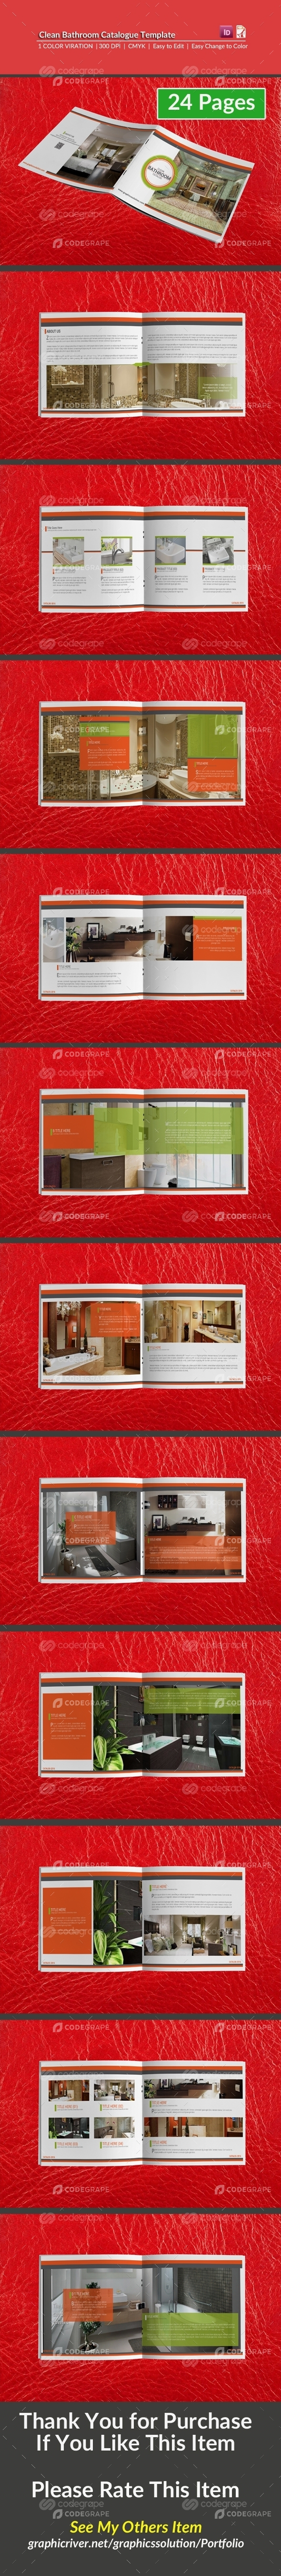 Clean Bathroom Catalogue Template